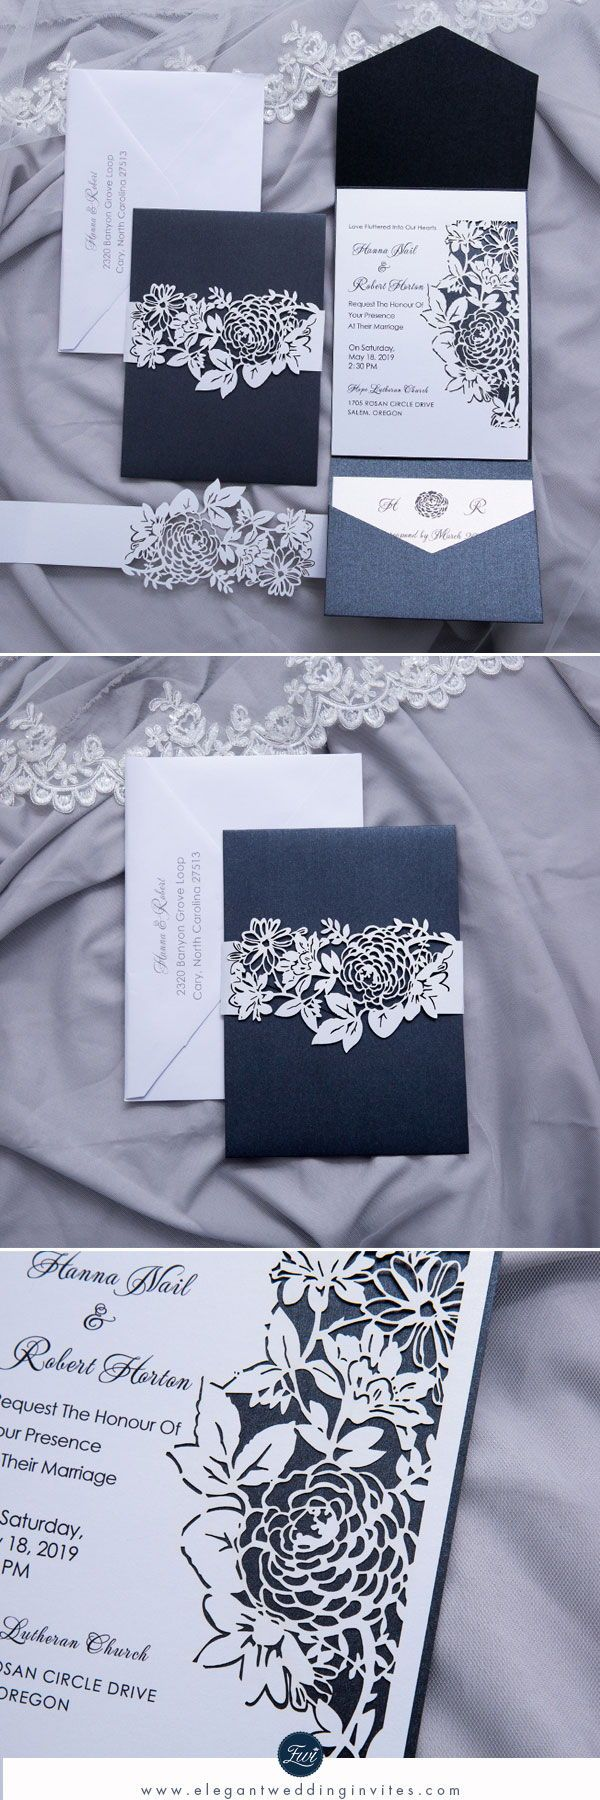 Wedding decorations at church january 2019 NewReleased Wedding Invitation Design and Matched Wedding Decor